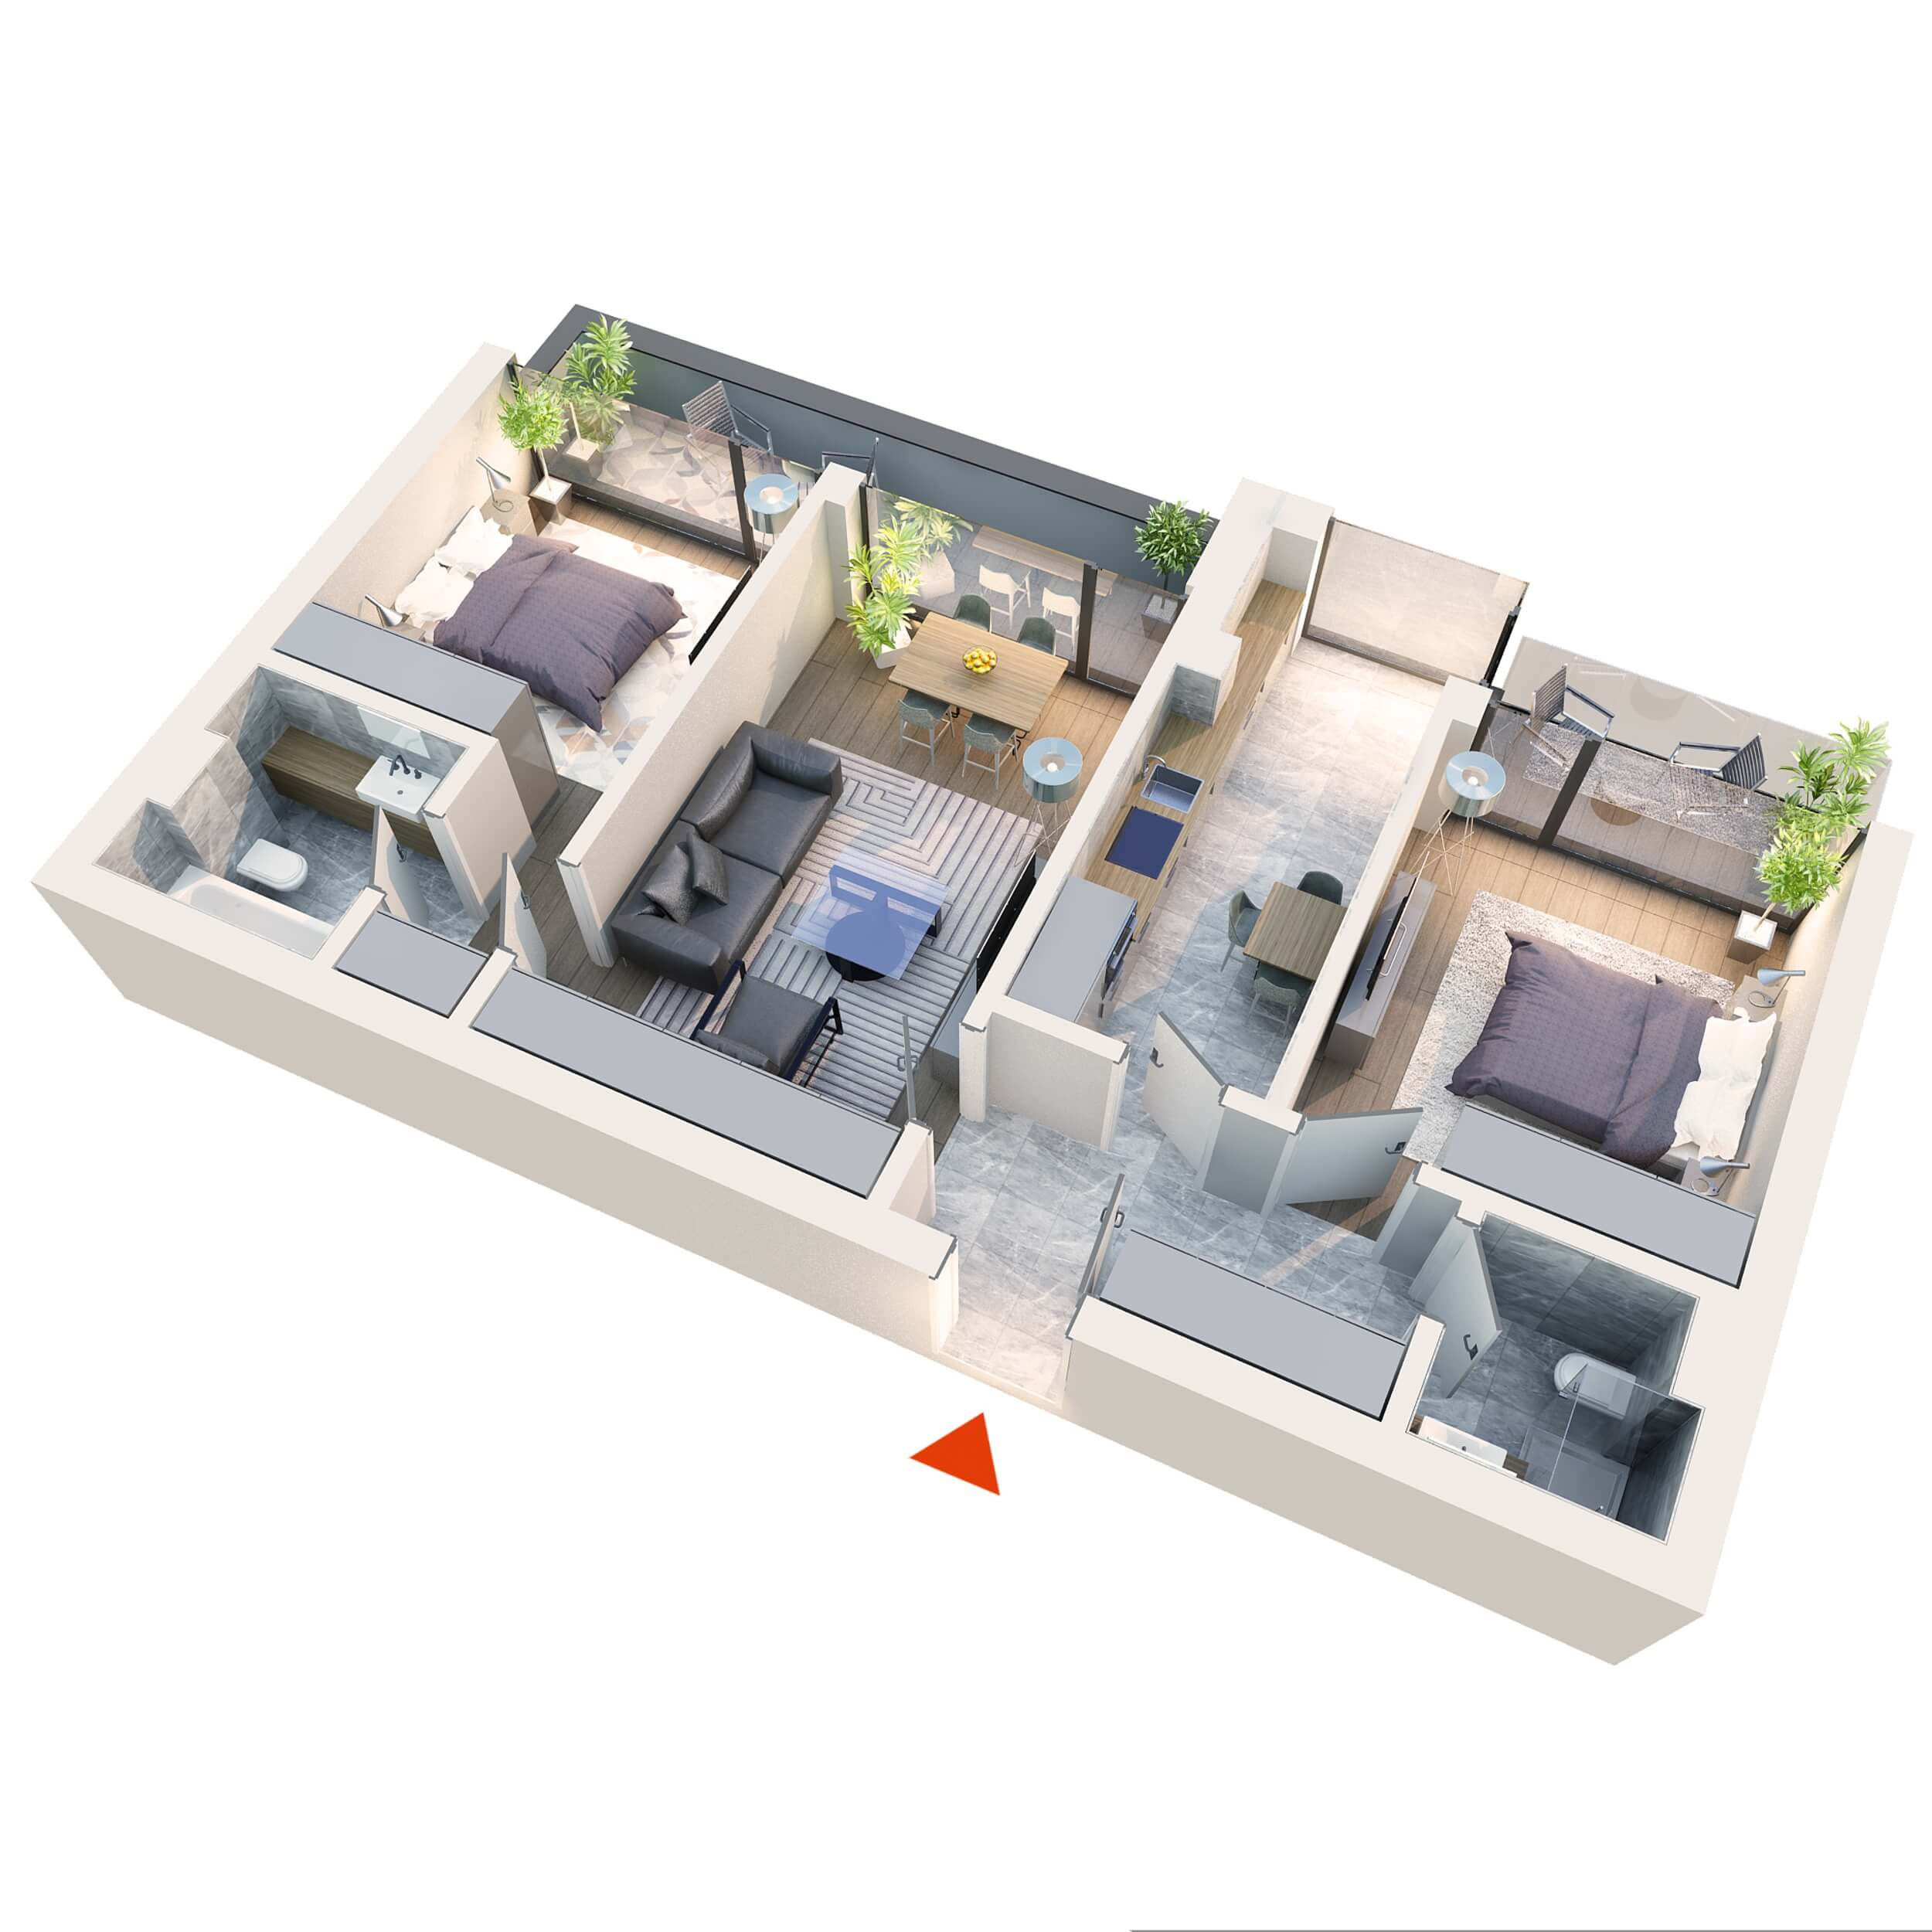 Apartament 3 camere tip 3B4 | 2 Balcoane | Etaj 1 – 3 | Corp C3 C4 | Faza 2